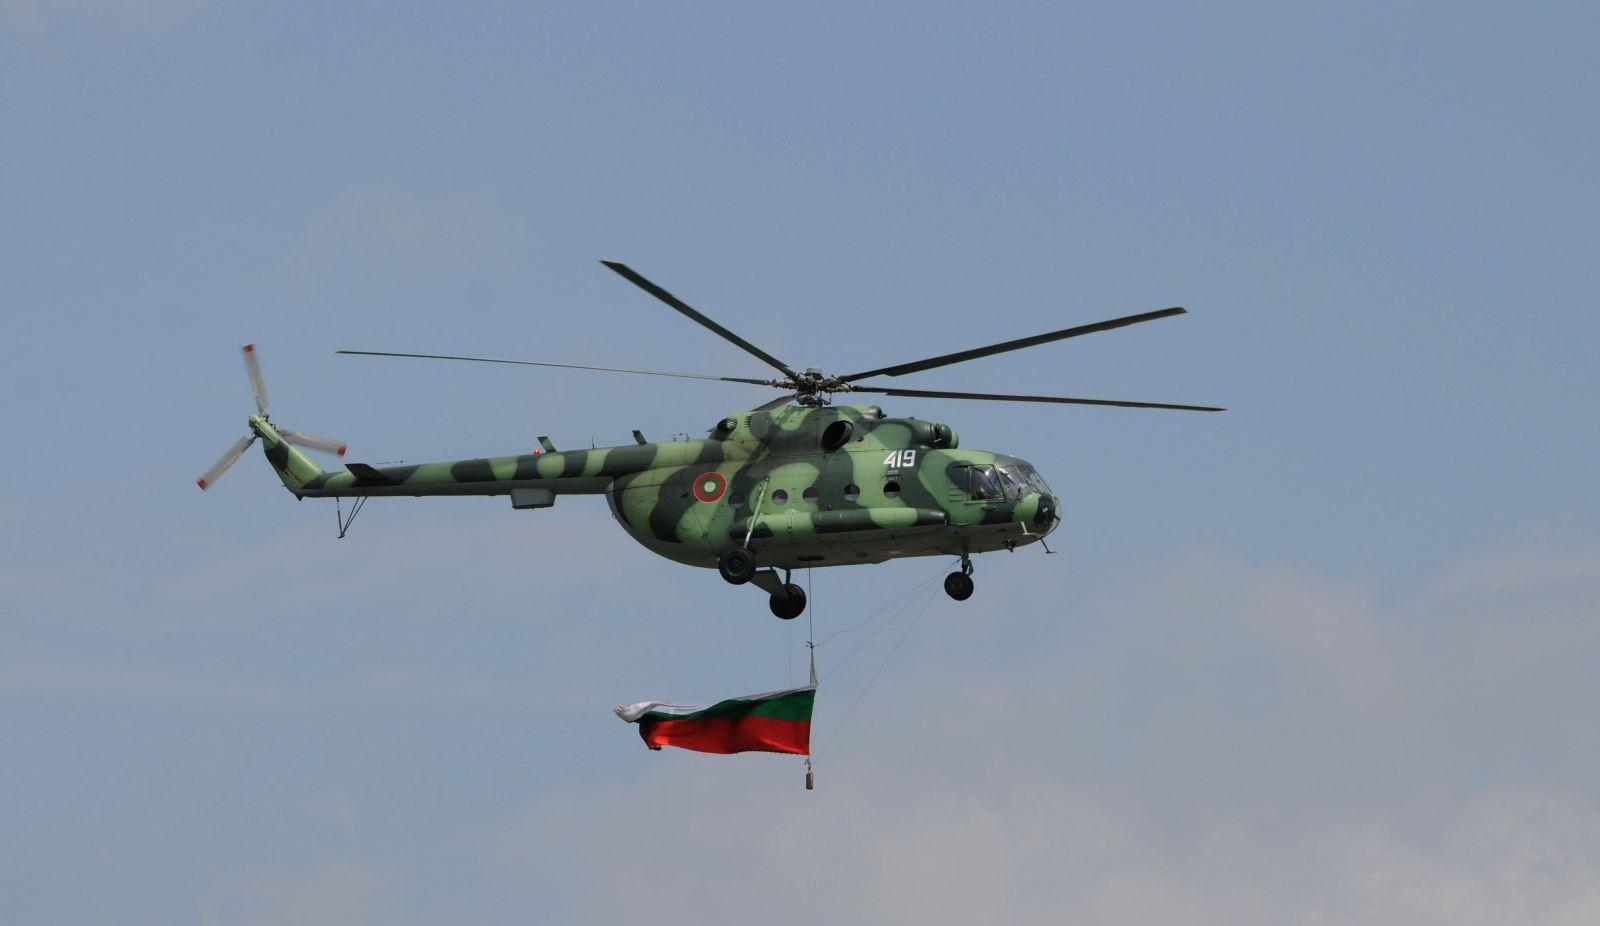 Report: Graf Ignatievo AFB Air Show